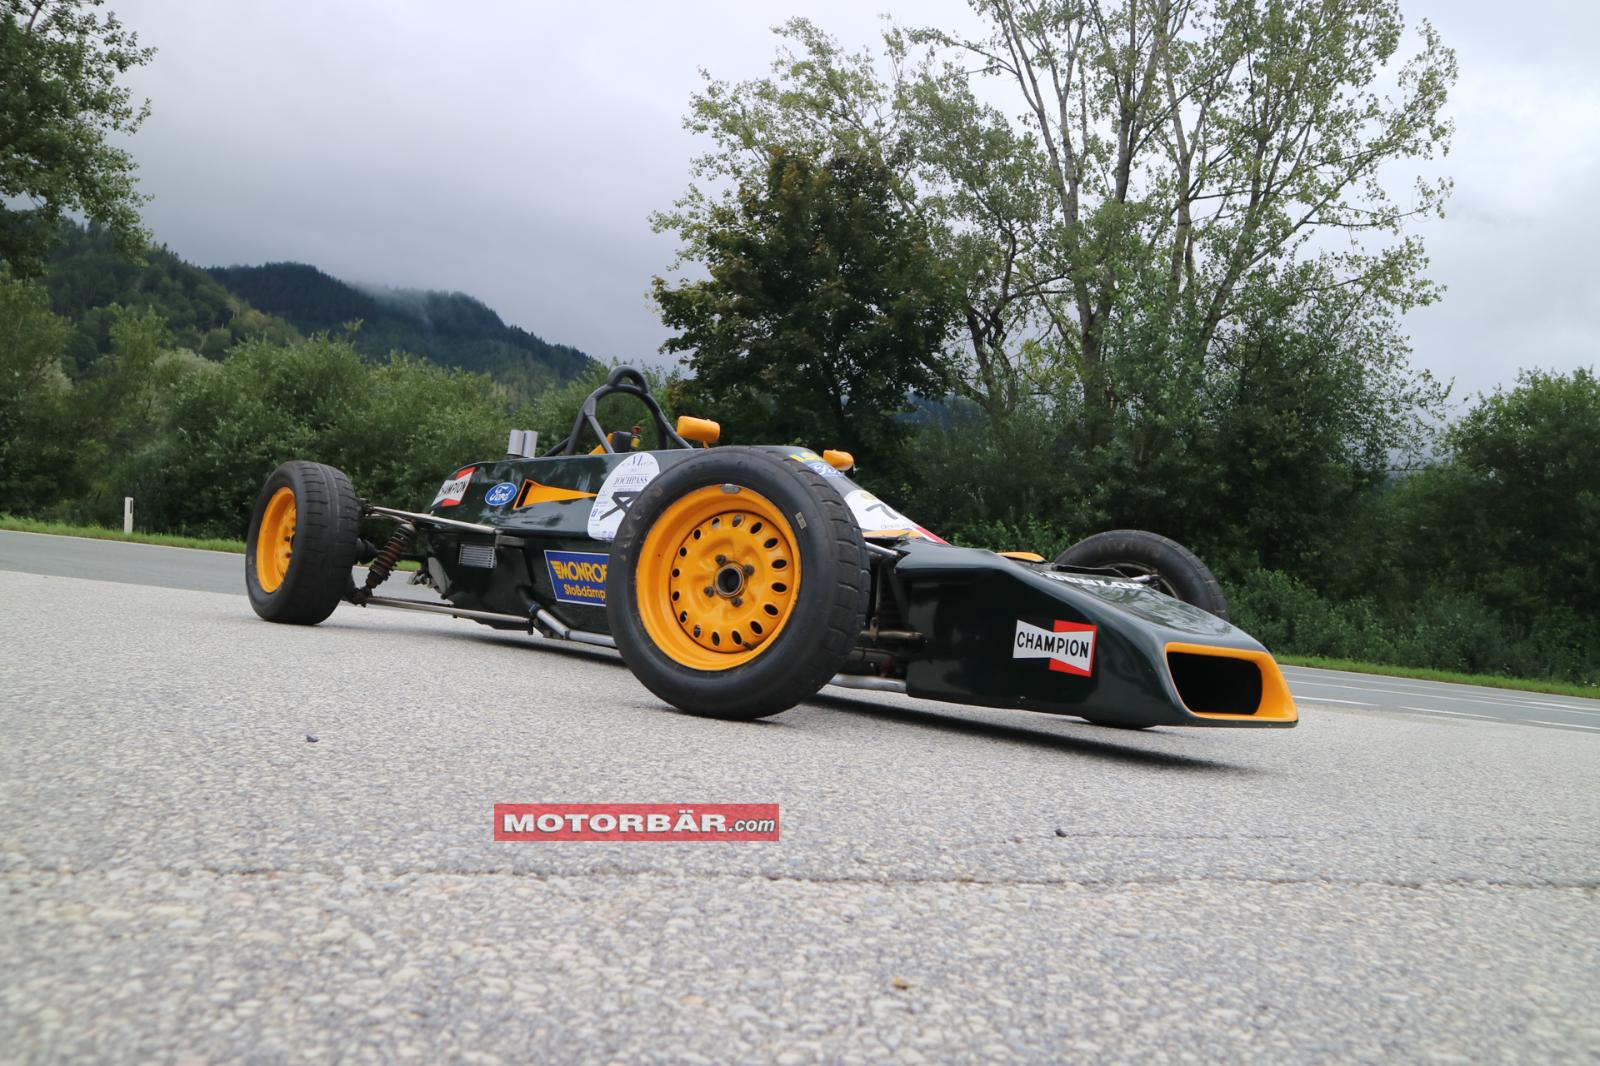 Formel Ford Van Diemen Racing Ayrton Senna da Silva Rennwagen Rennauto Historic